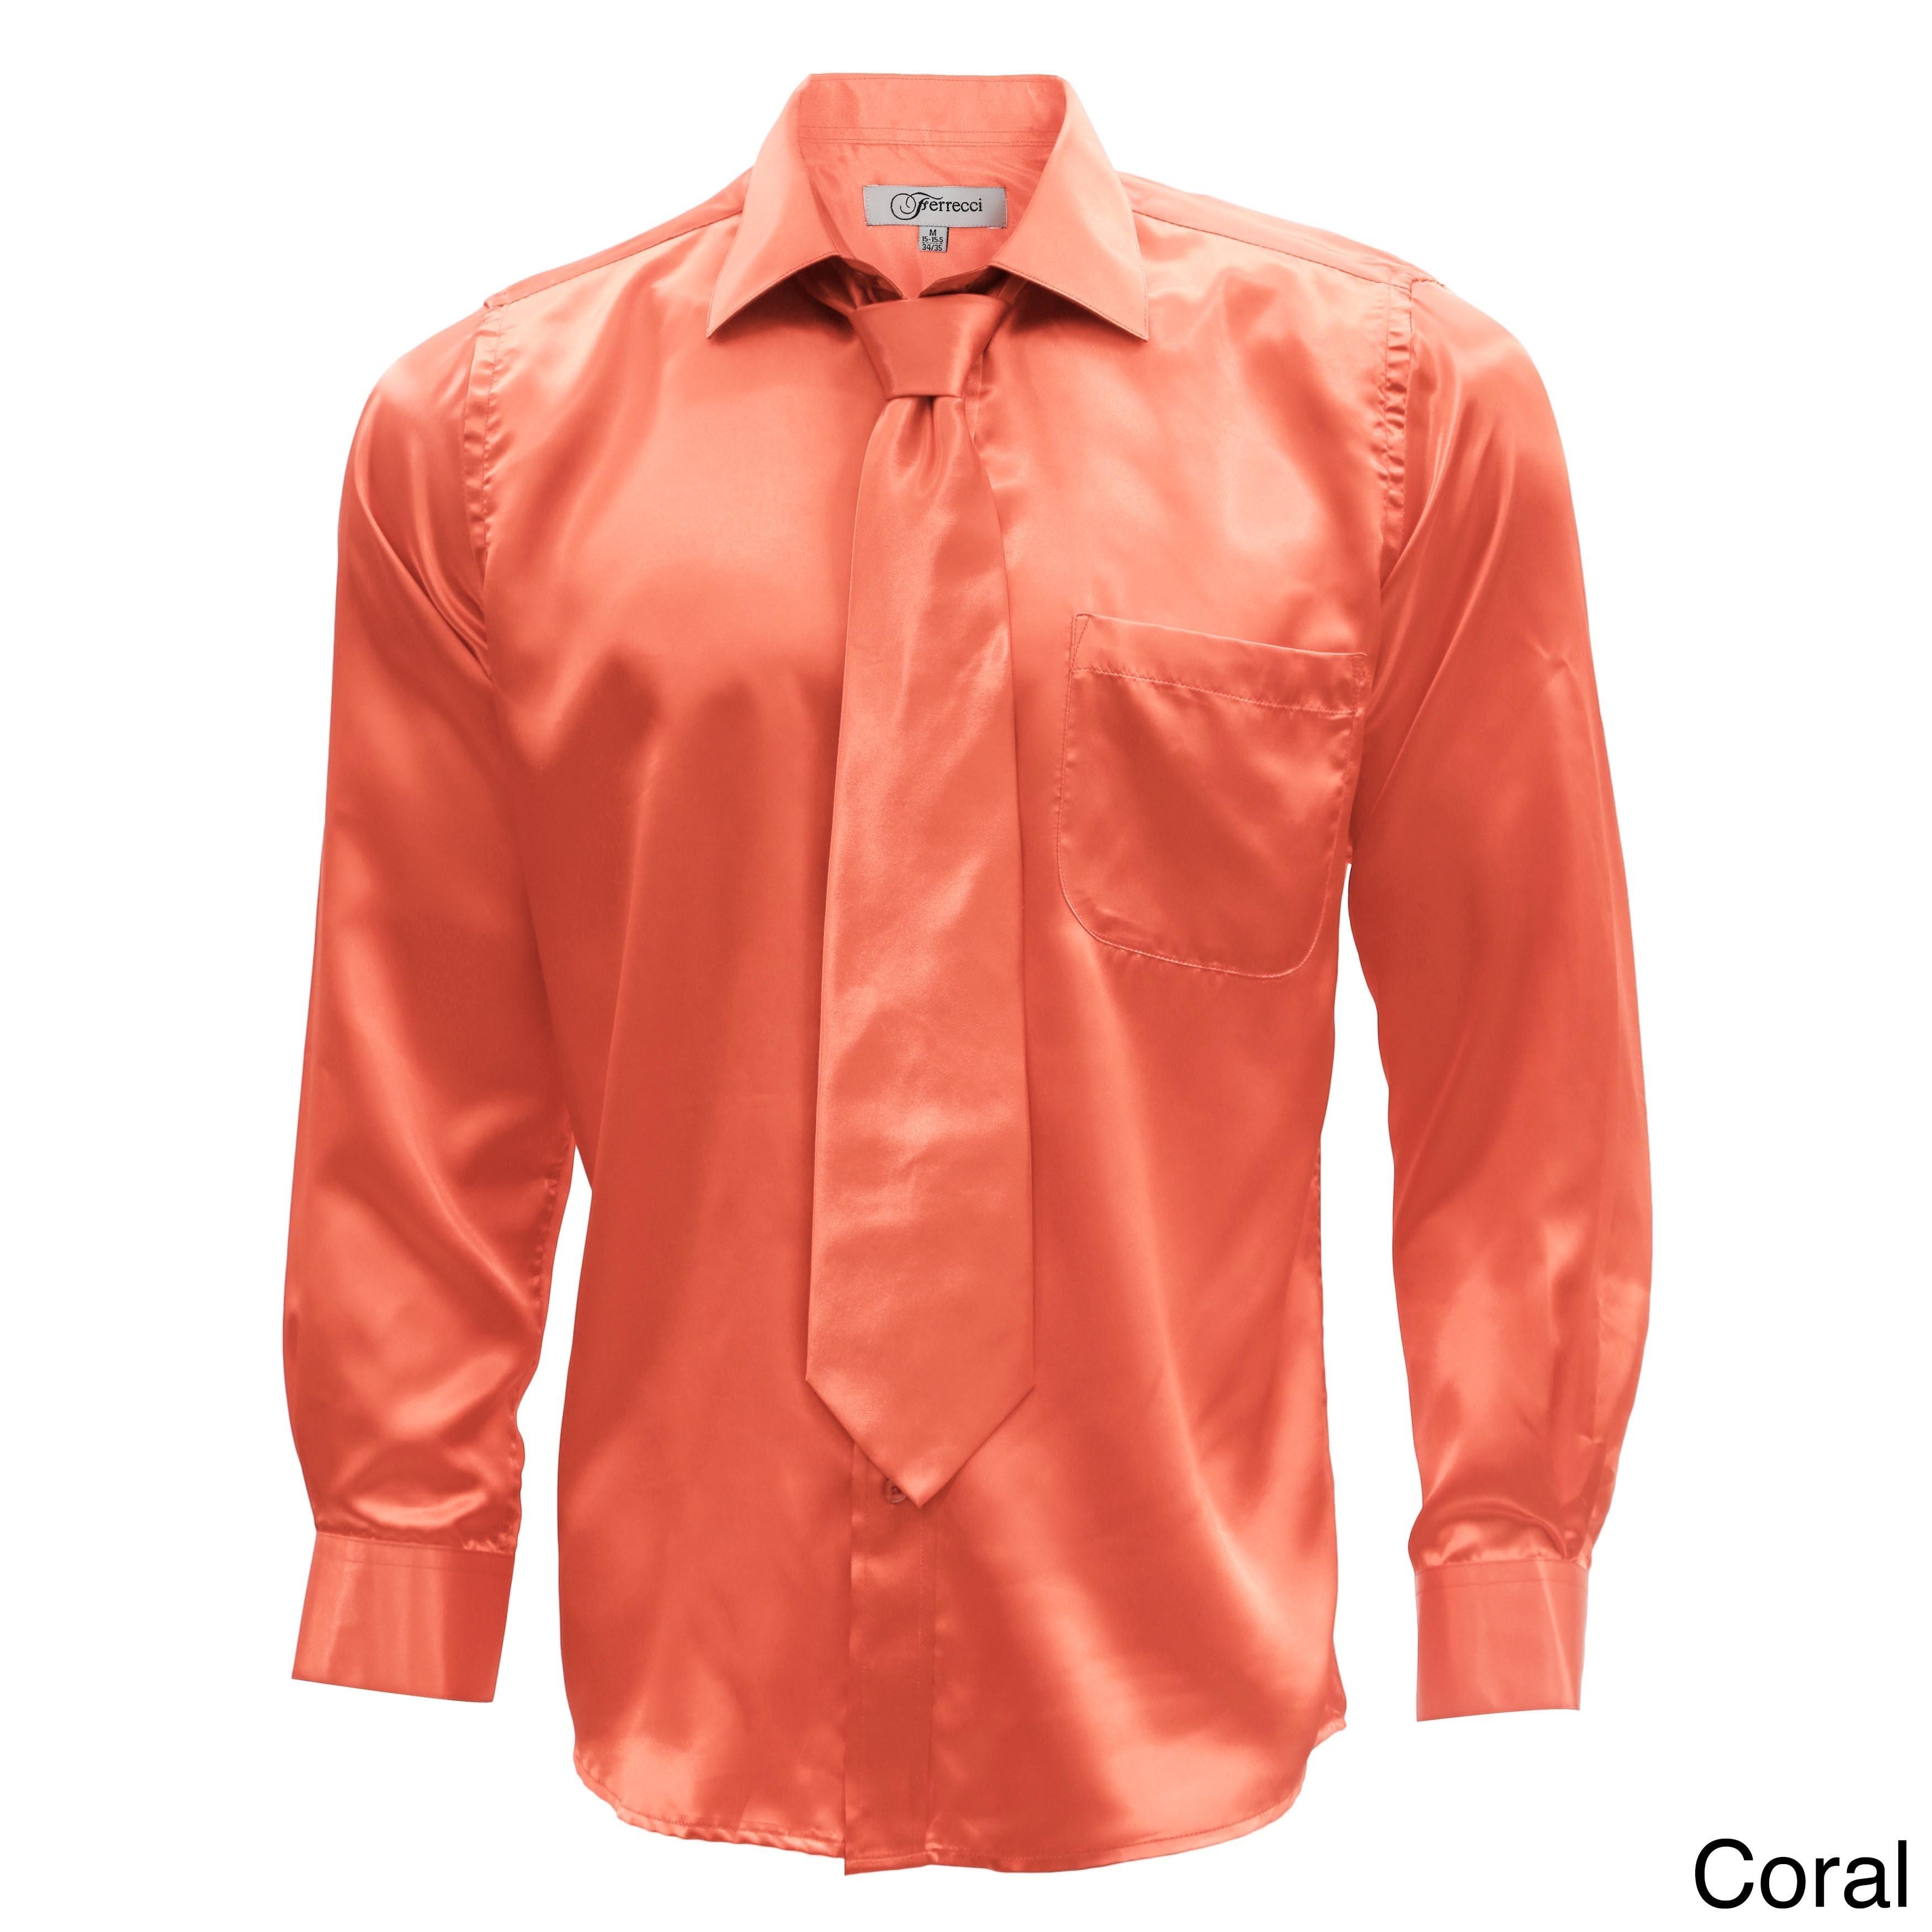 laest technology enjoy clearance price bottom price Satin Mens Dress Shirt Necktie & Hanky Set - XS to Big & Tall